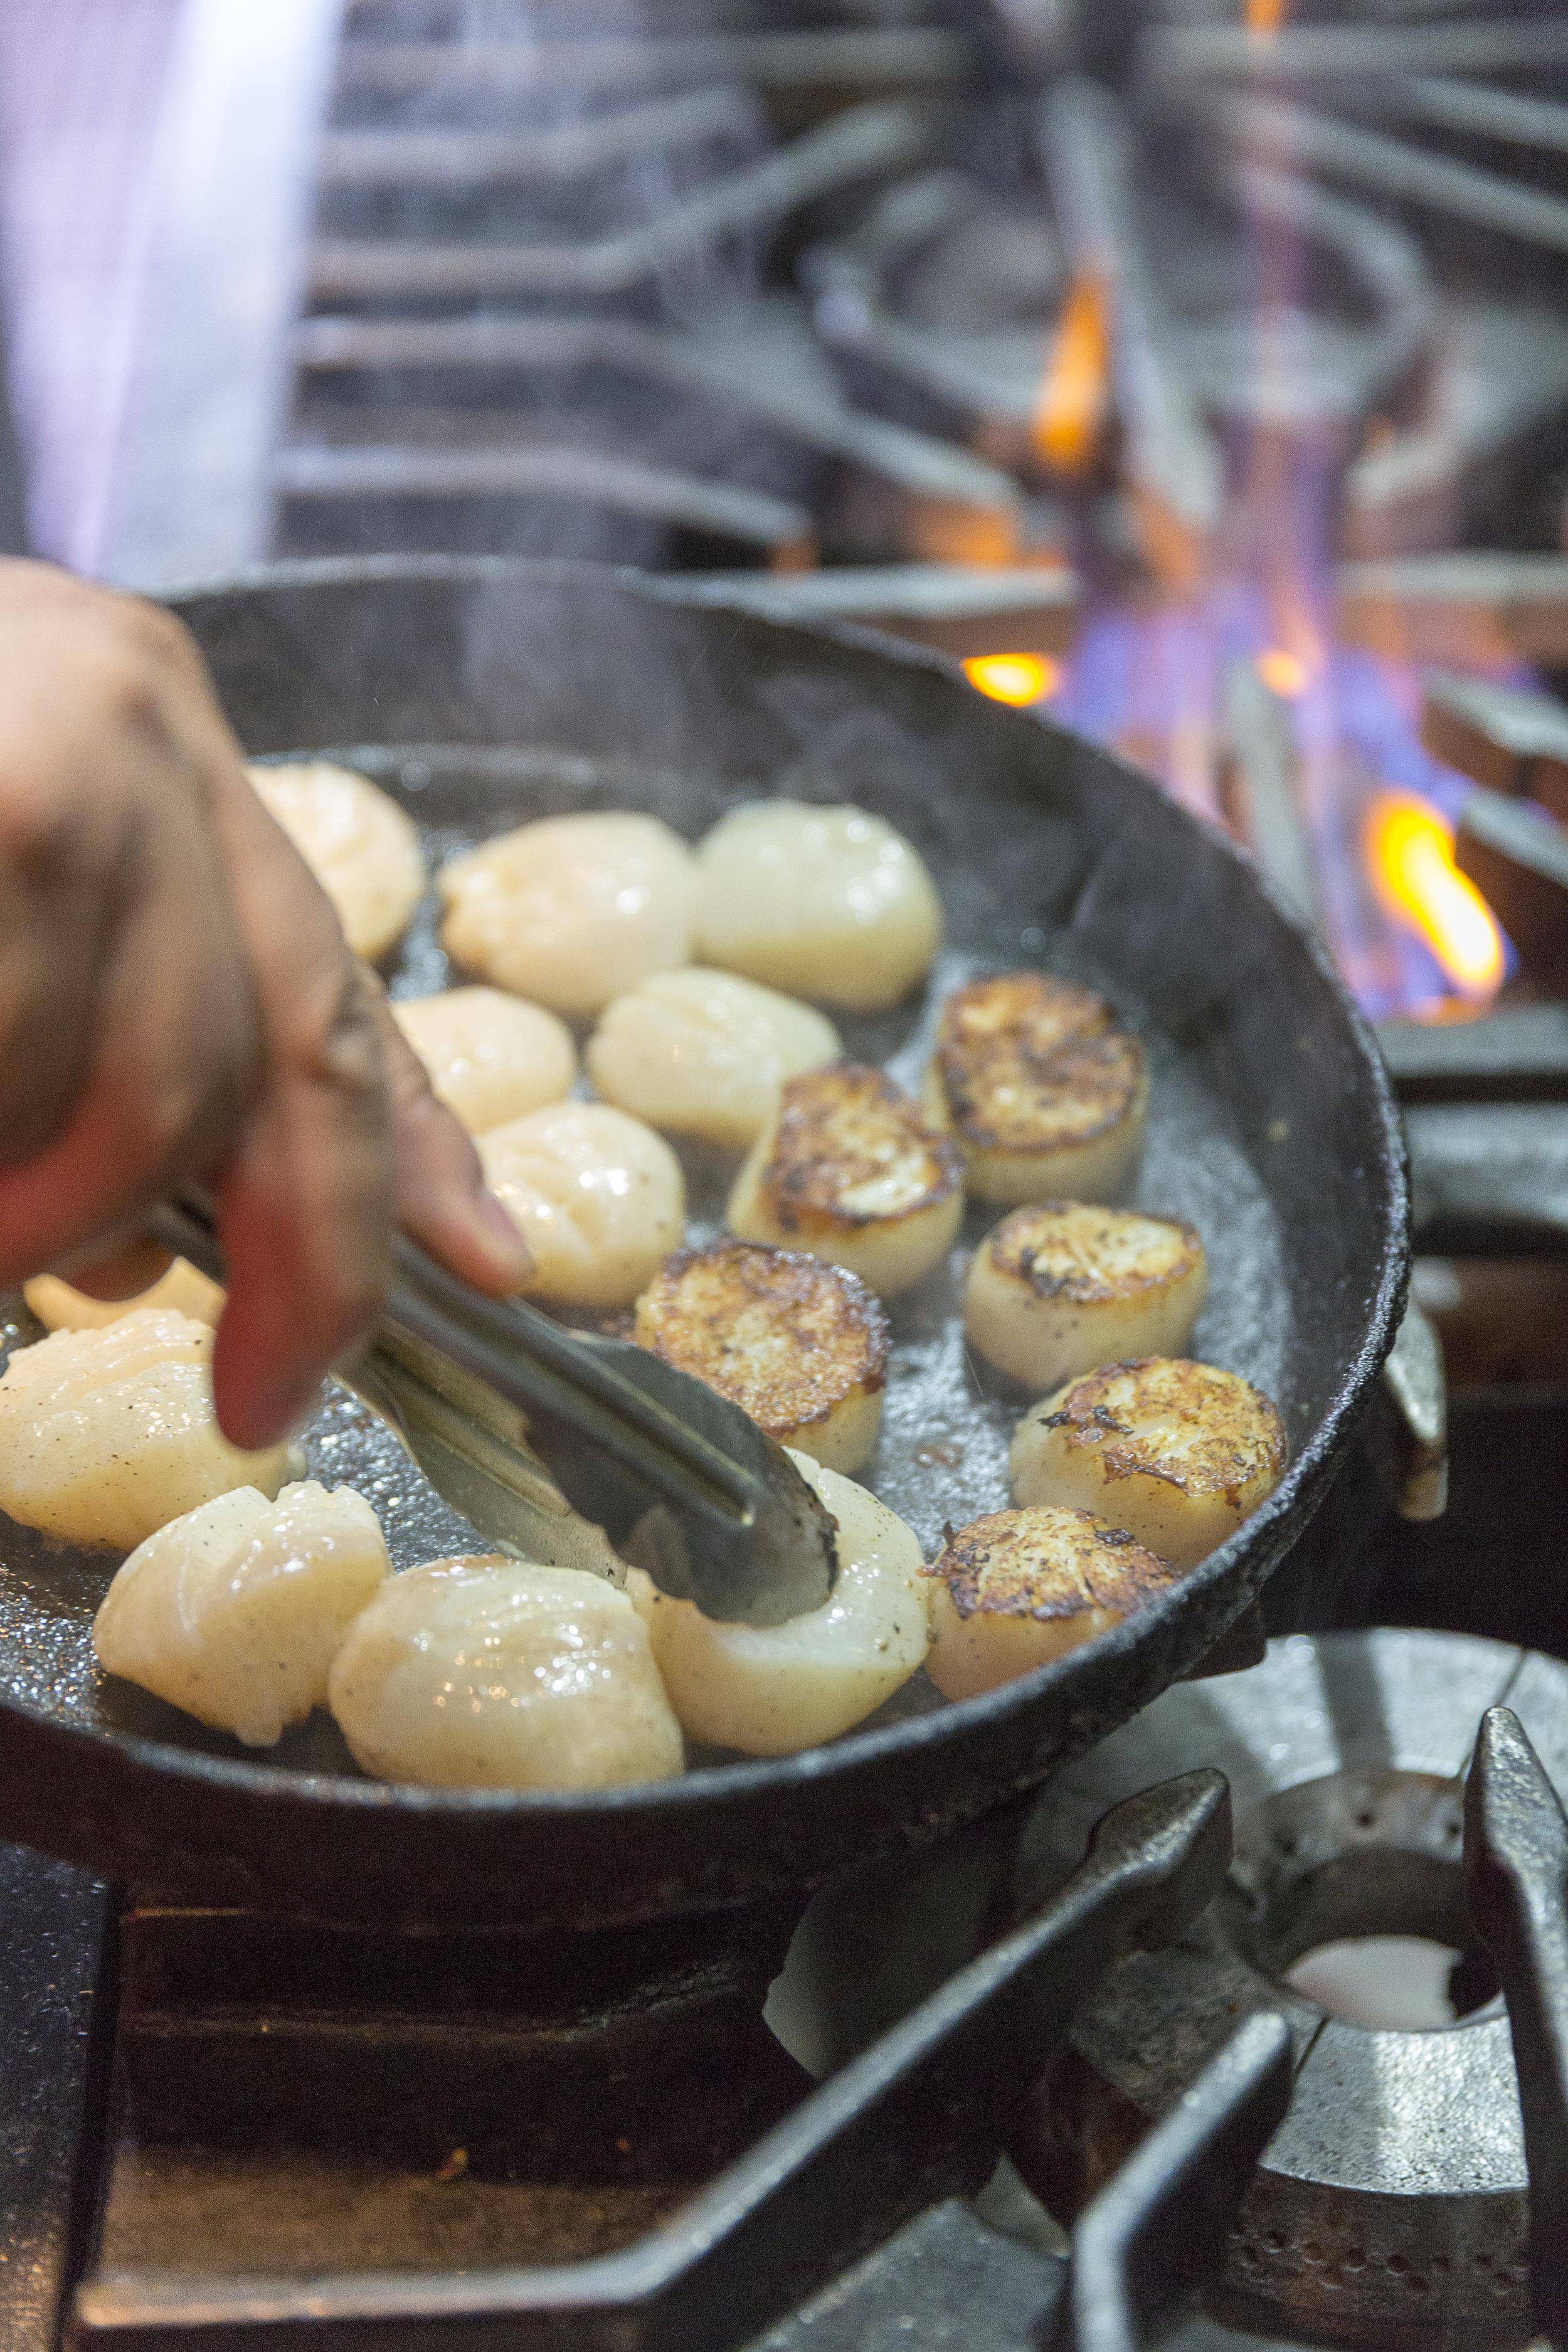 20180306_cfrf_sourcing_ri_seafood_030.jpg